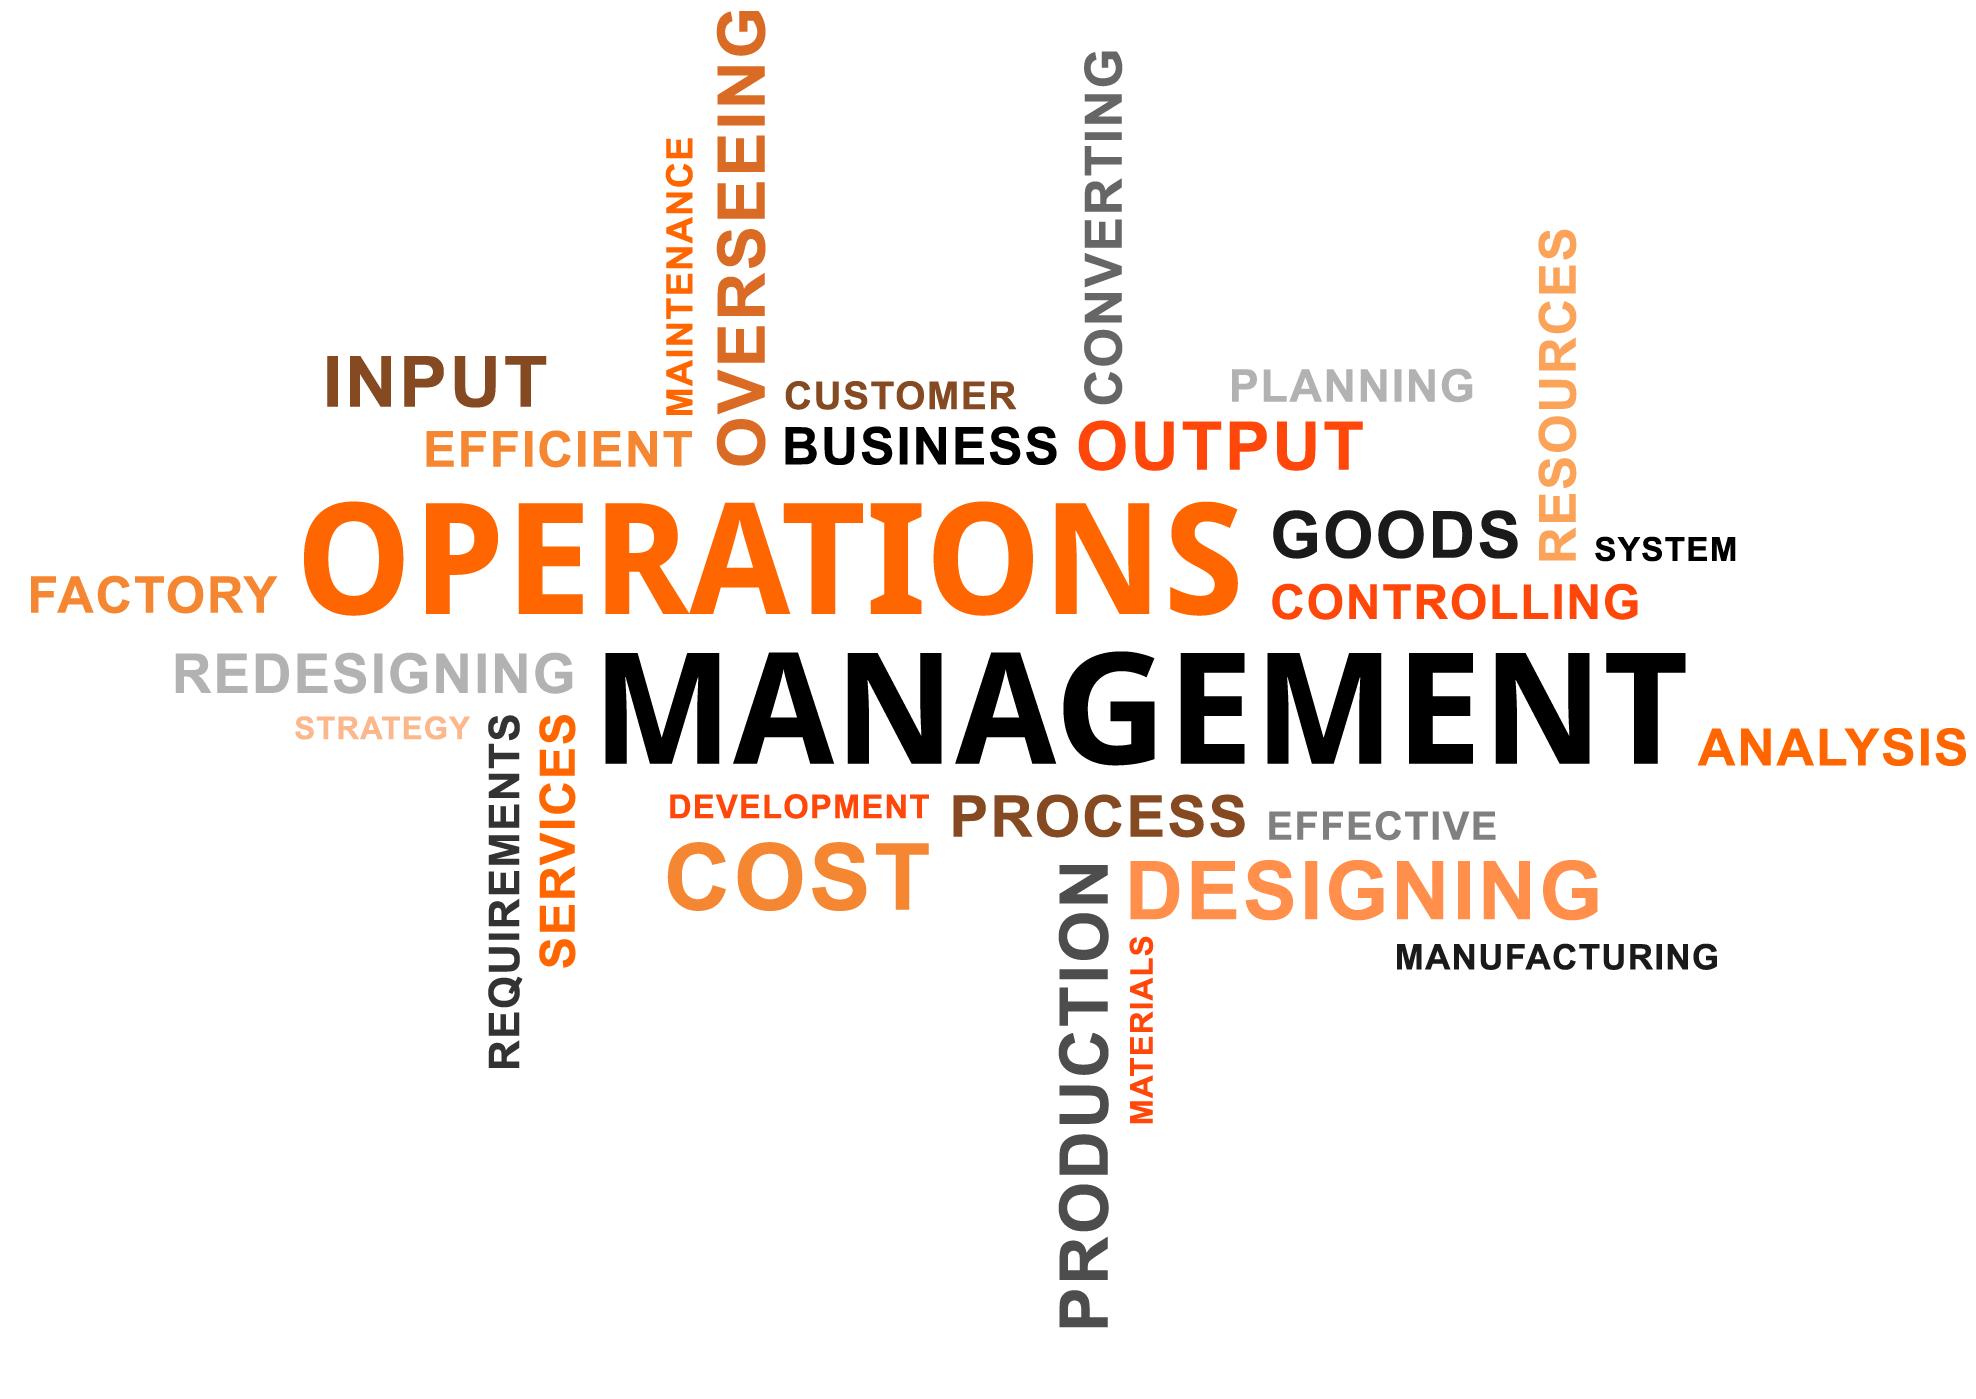 what is vendor development process